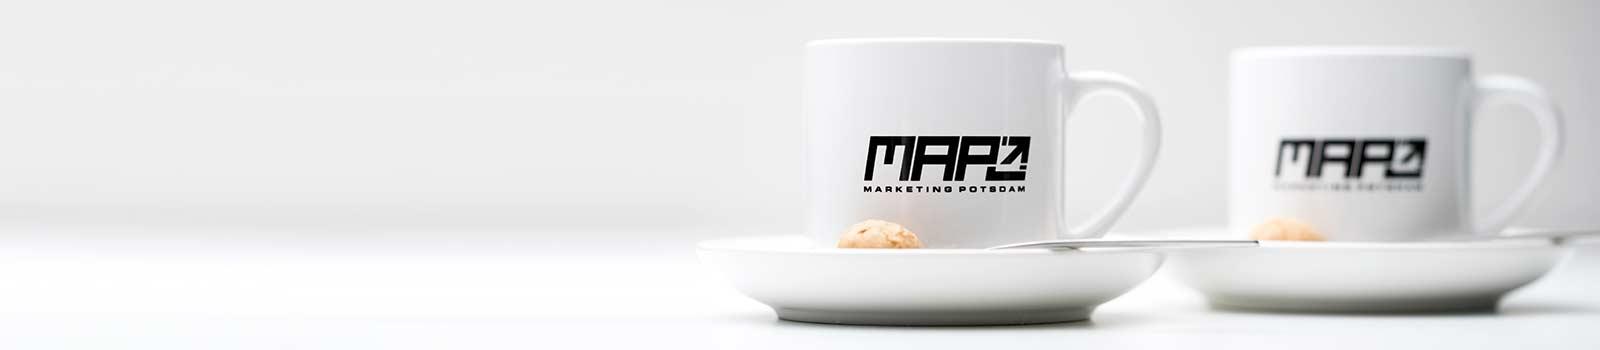 Werbeagentur Mapo-Marketing Potsdam, Kontakt aufnehmen